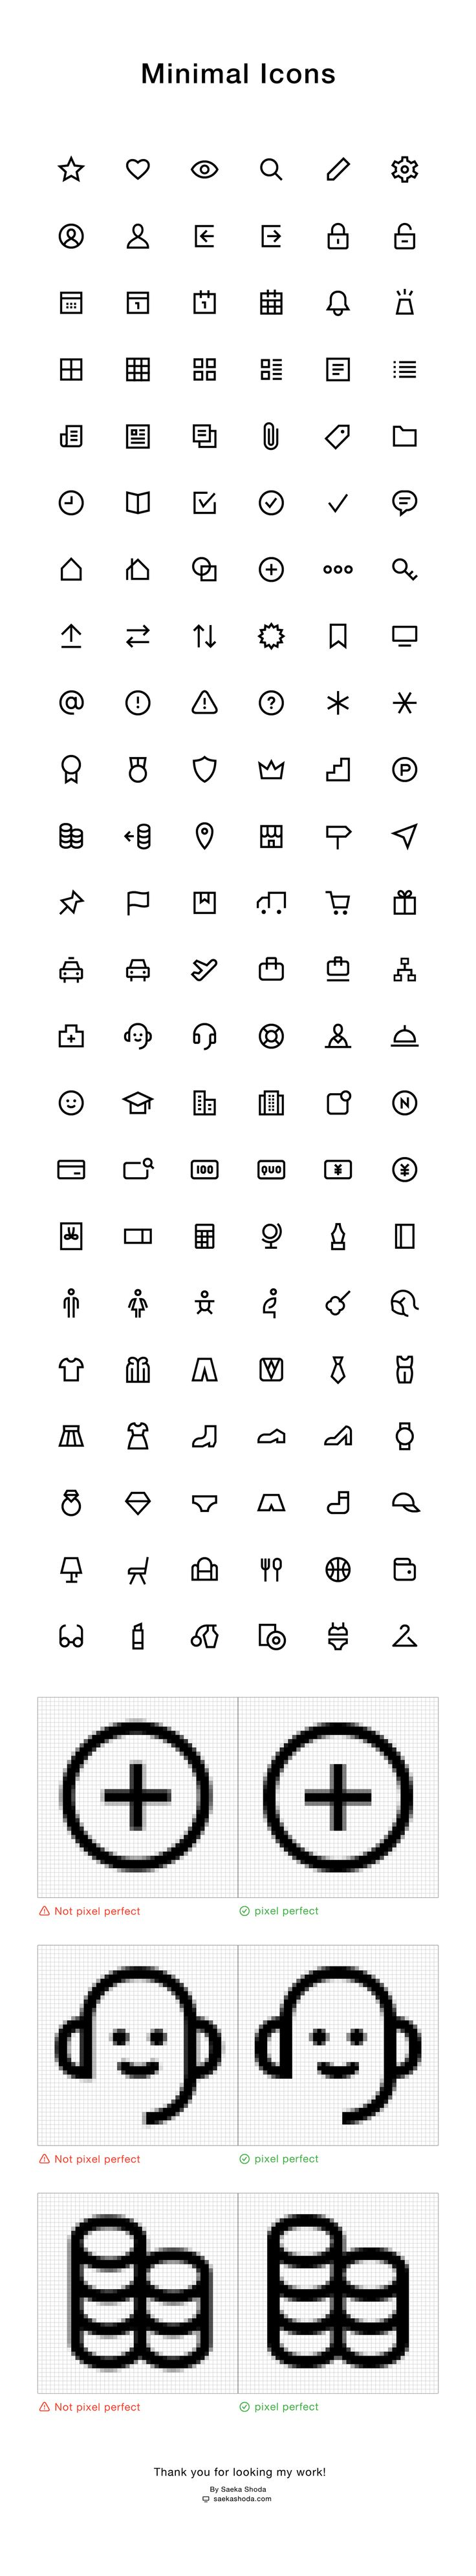 Works | Minimal Icons on Behance By Saeka Shoda